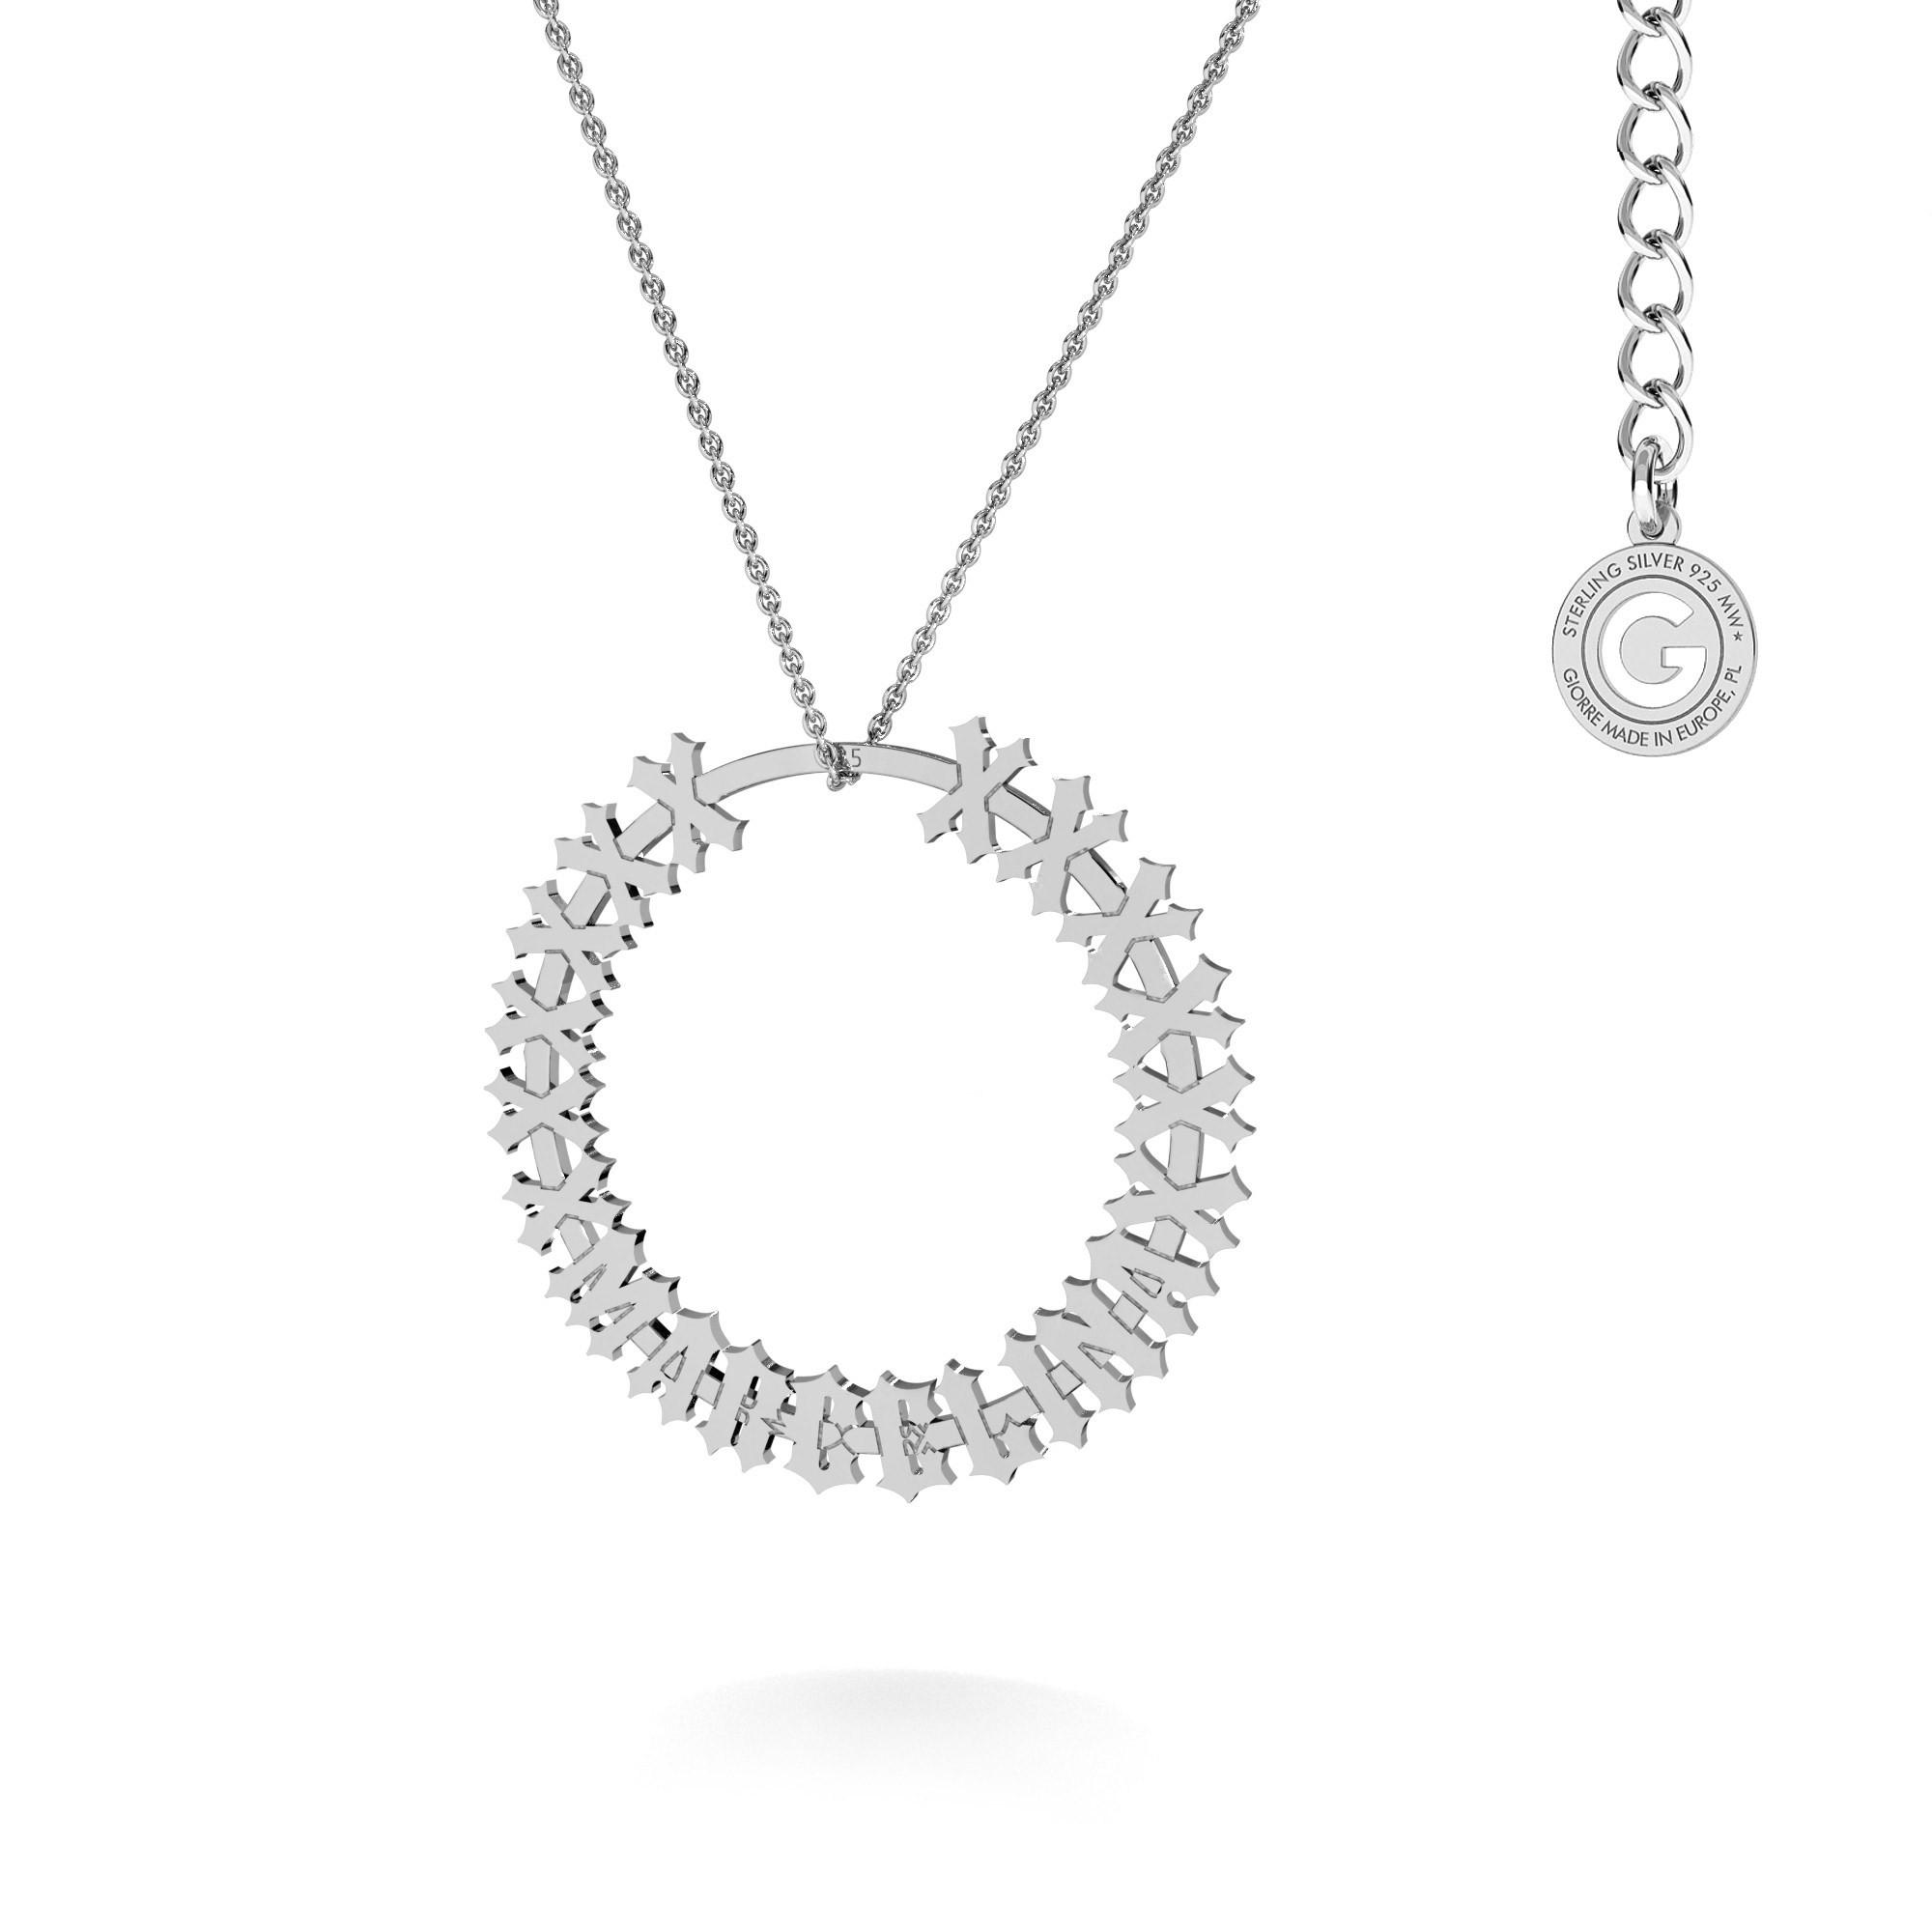 MON DÉFI Necklace - anatomic heart, sterling silver 925